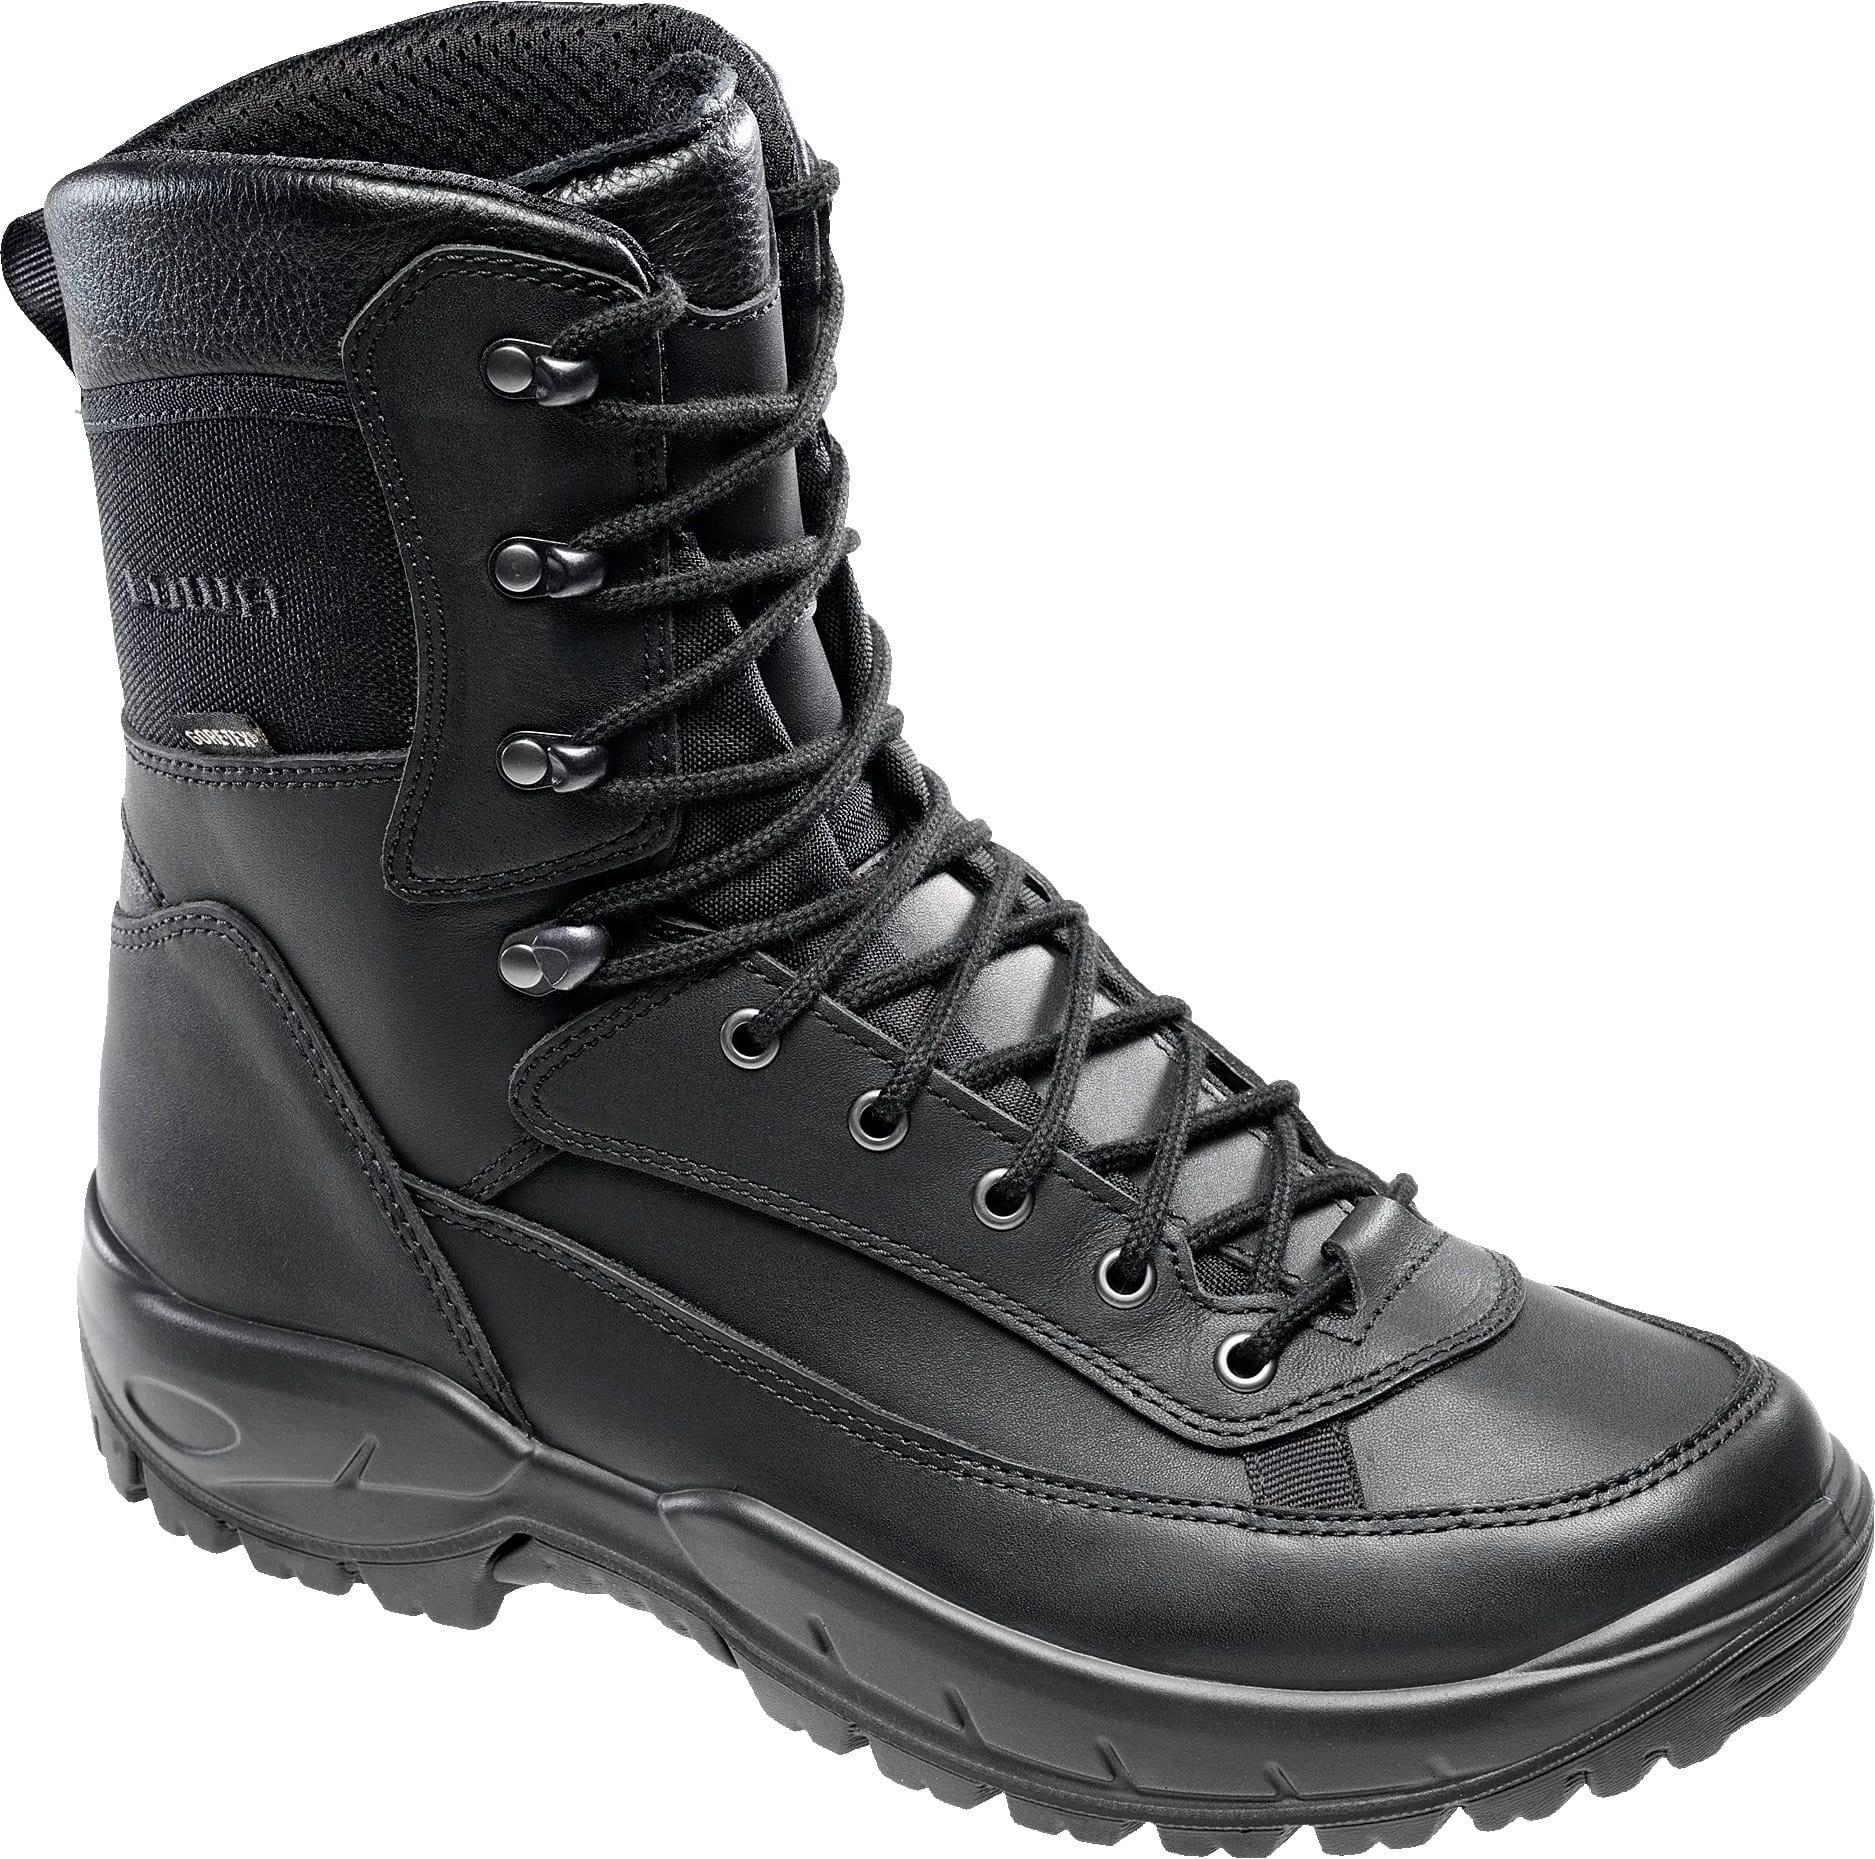 Lowa Recon GTX TF Chaussures de travail